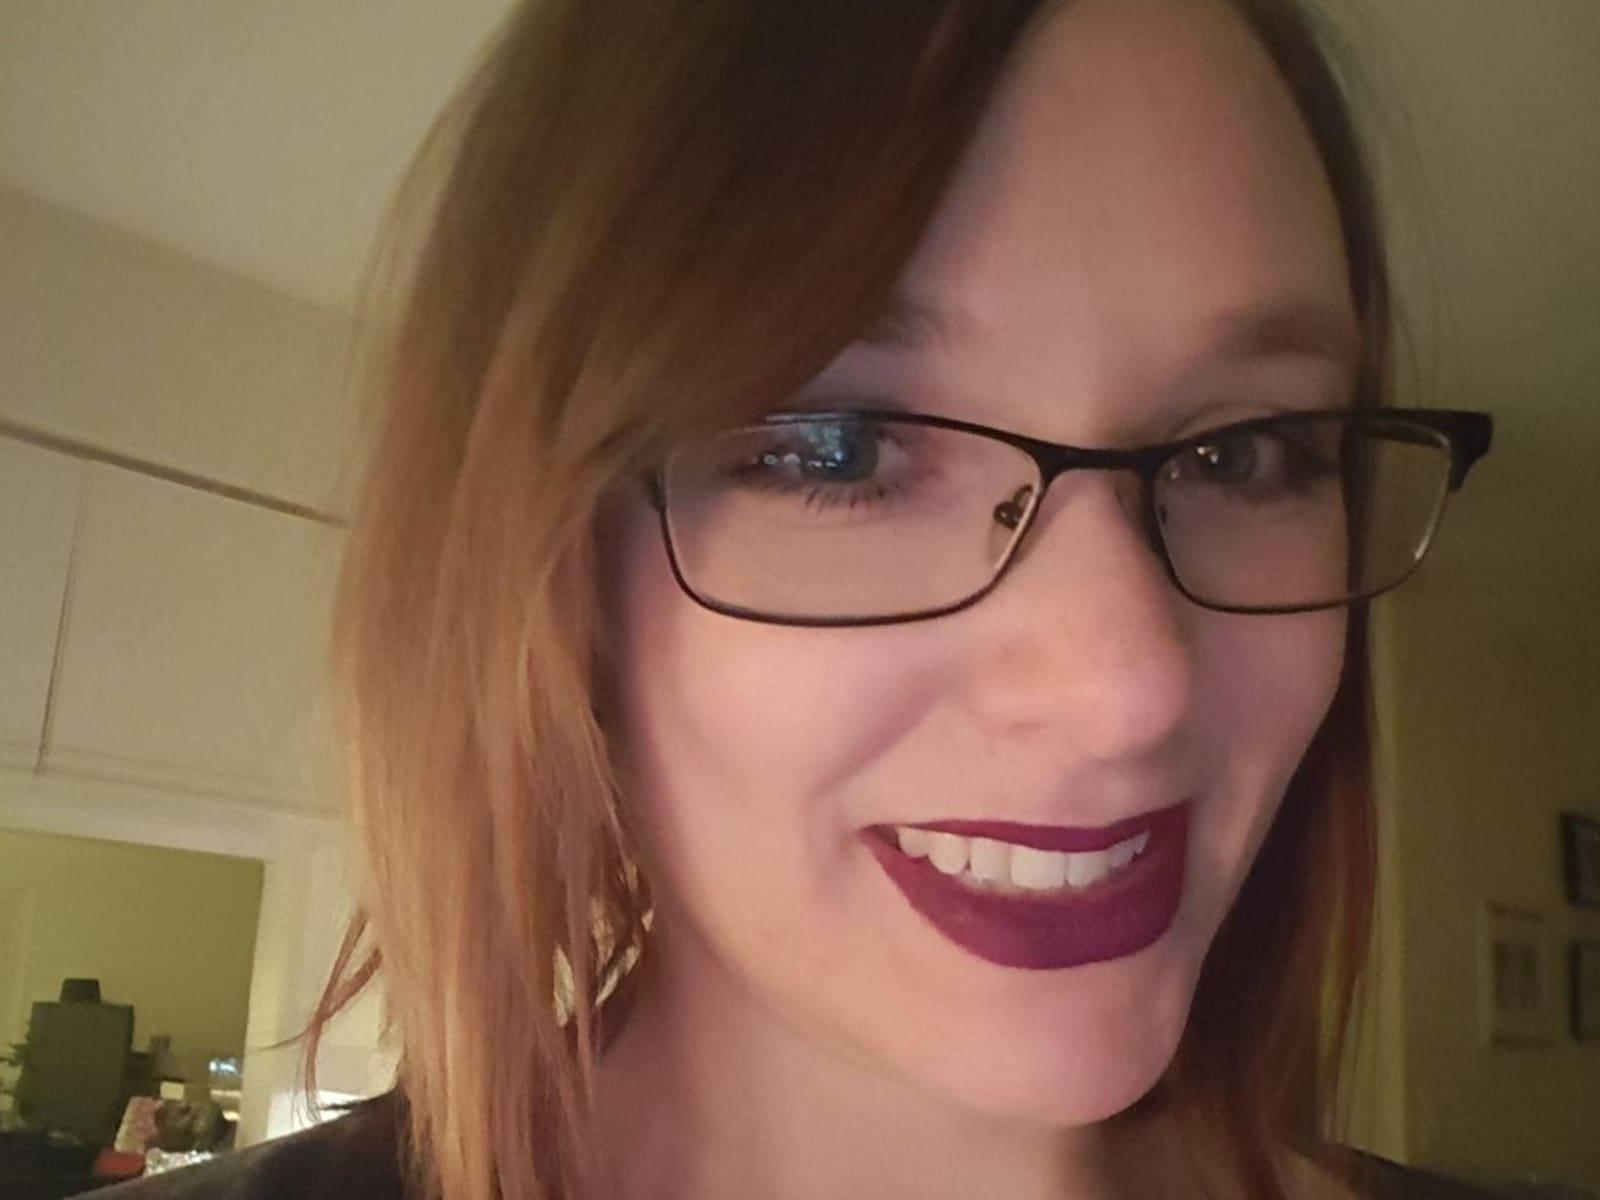 Sara from Toronto, Ontario, Canada